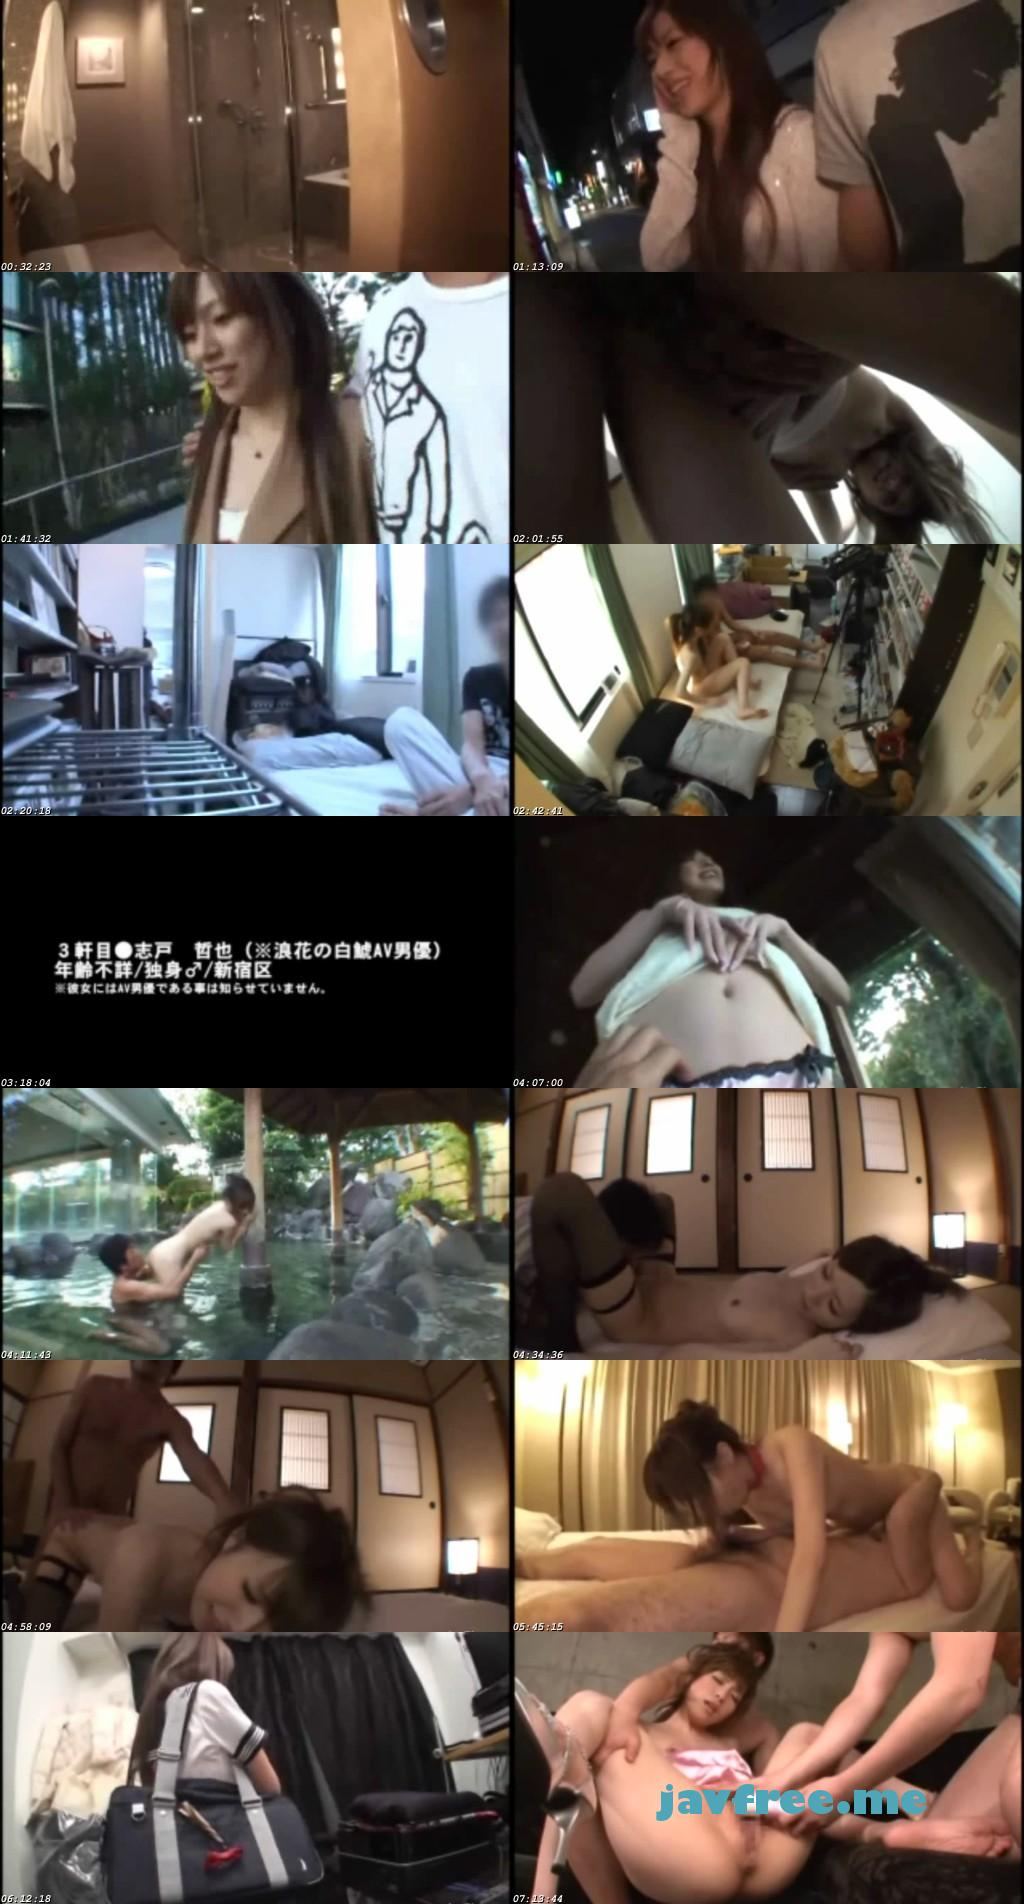 [PPB 012] 藤澤美羽 PRESTIGE PREMIUM BEST 8時間 藤澤美羽 PPB